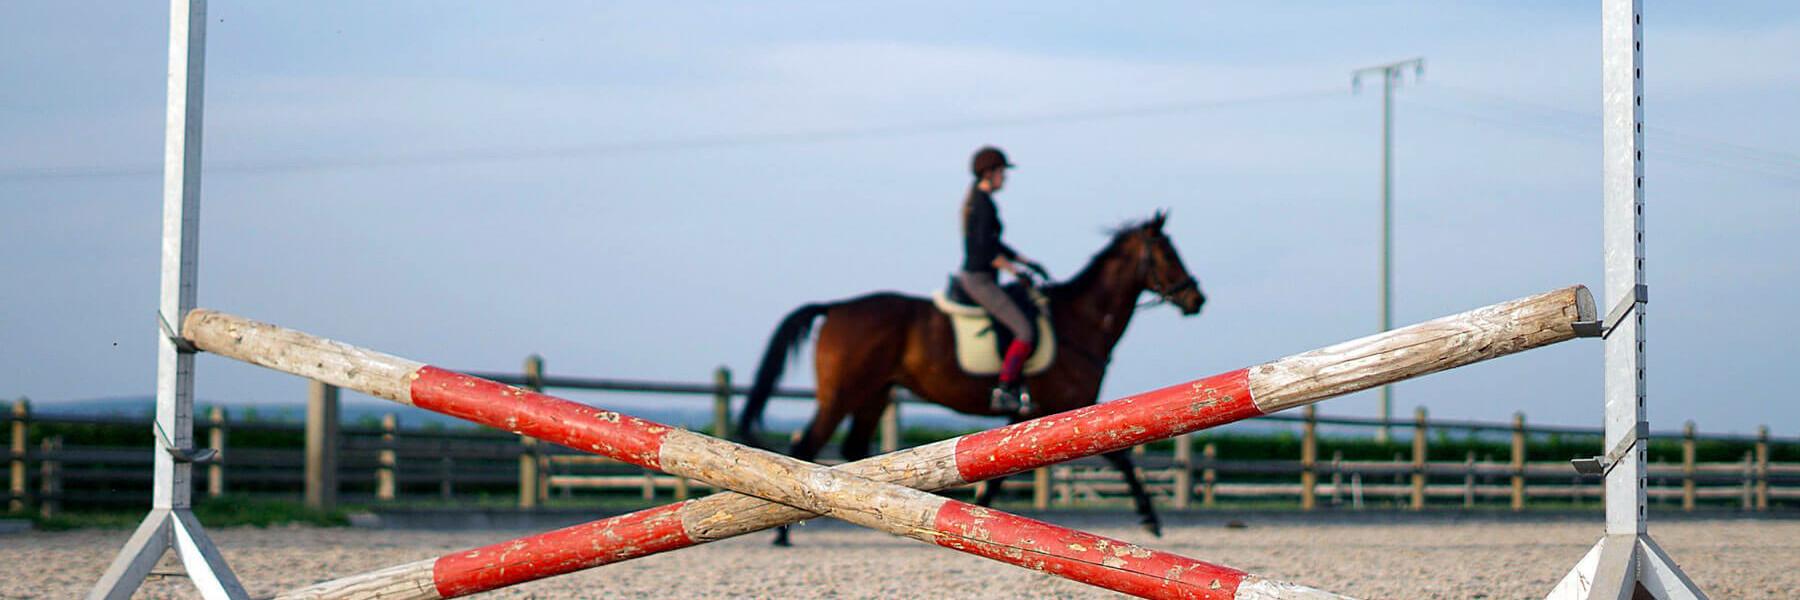 exercice du mois cheval équitation